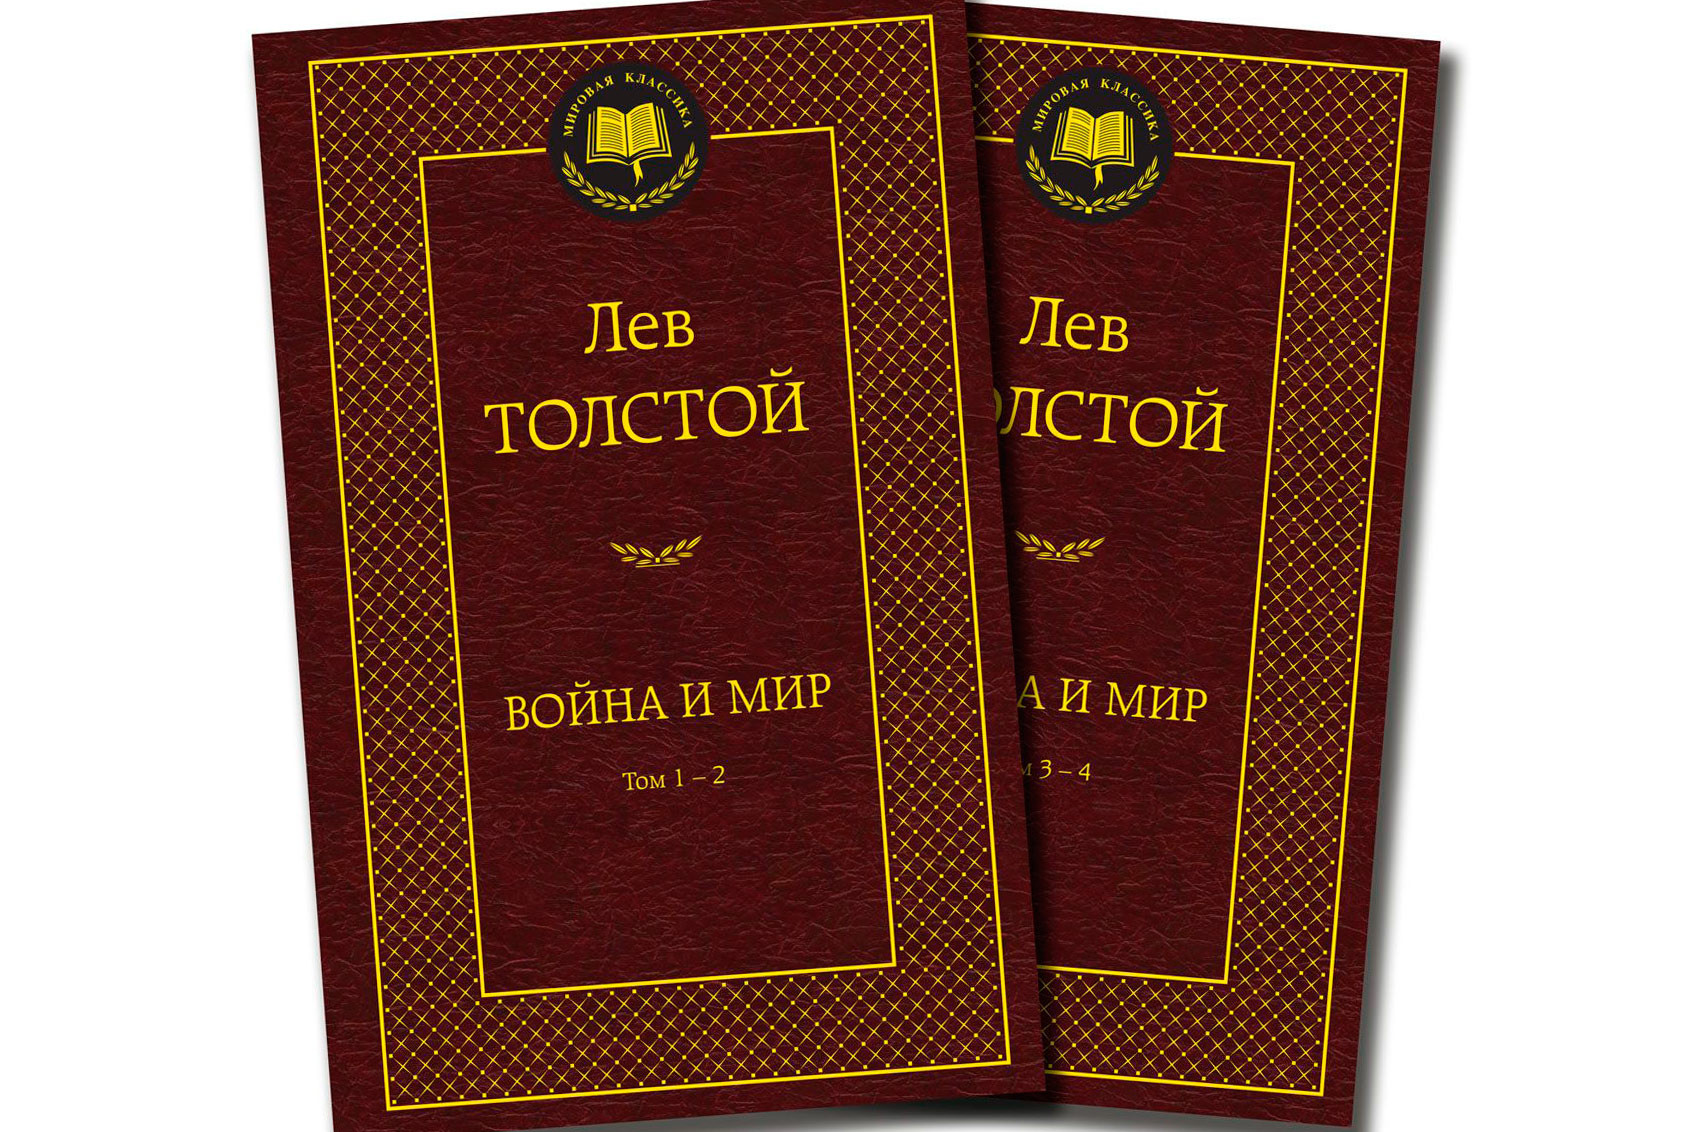 "<p>Фото: &copy;&nbsp;<a href=""http://www.ozon.ru/context/detail/id/25116492/"" target=""_blank"">ozon.ru</a></p>"